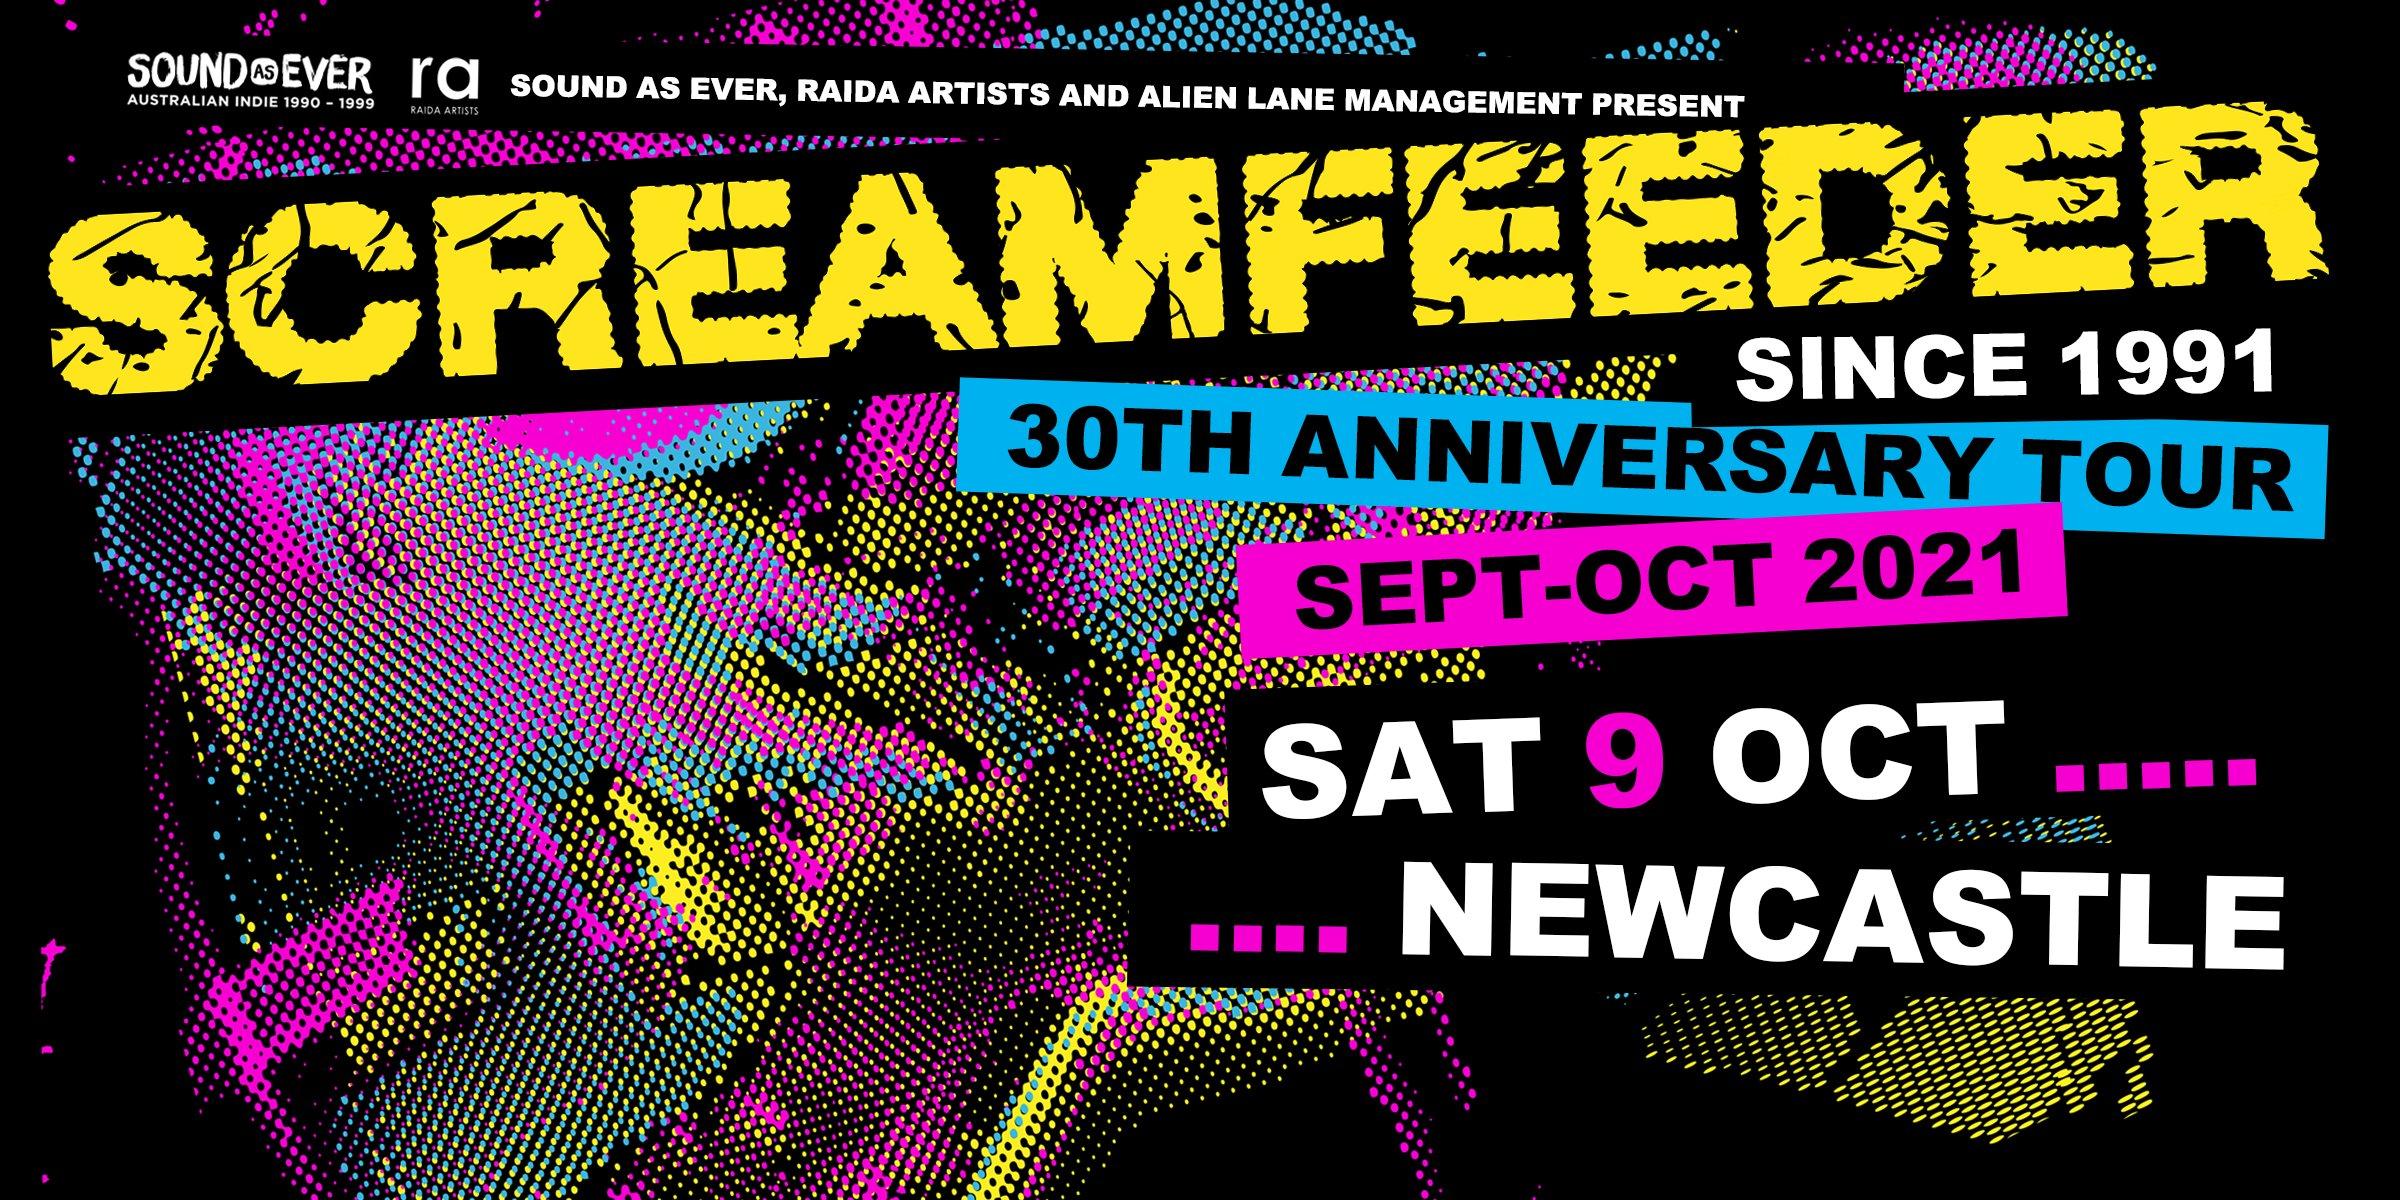 Screamfeeder Since 1991 Tour 2021 – Newcastle: The Cambridge